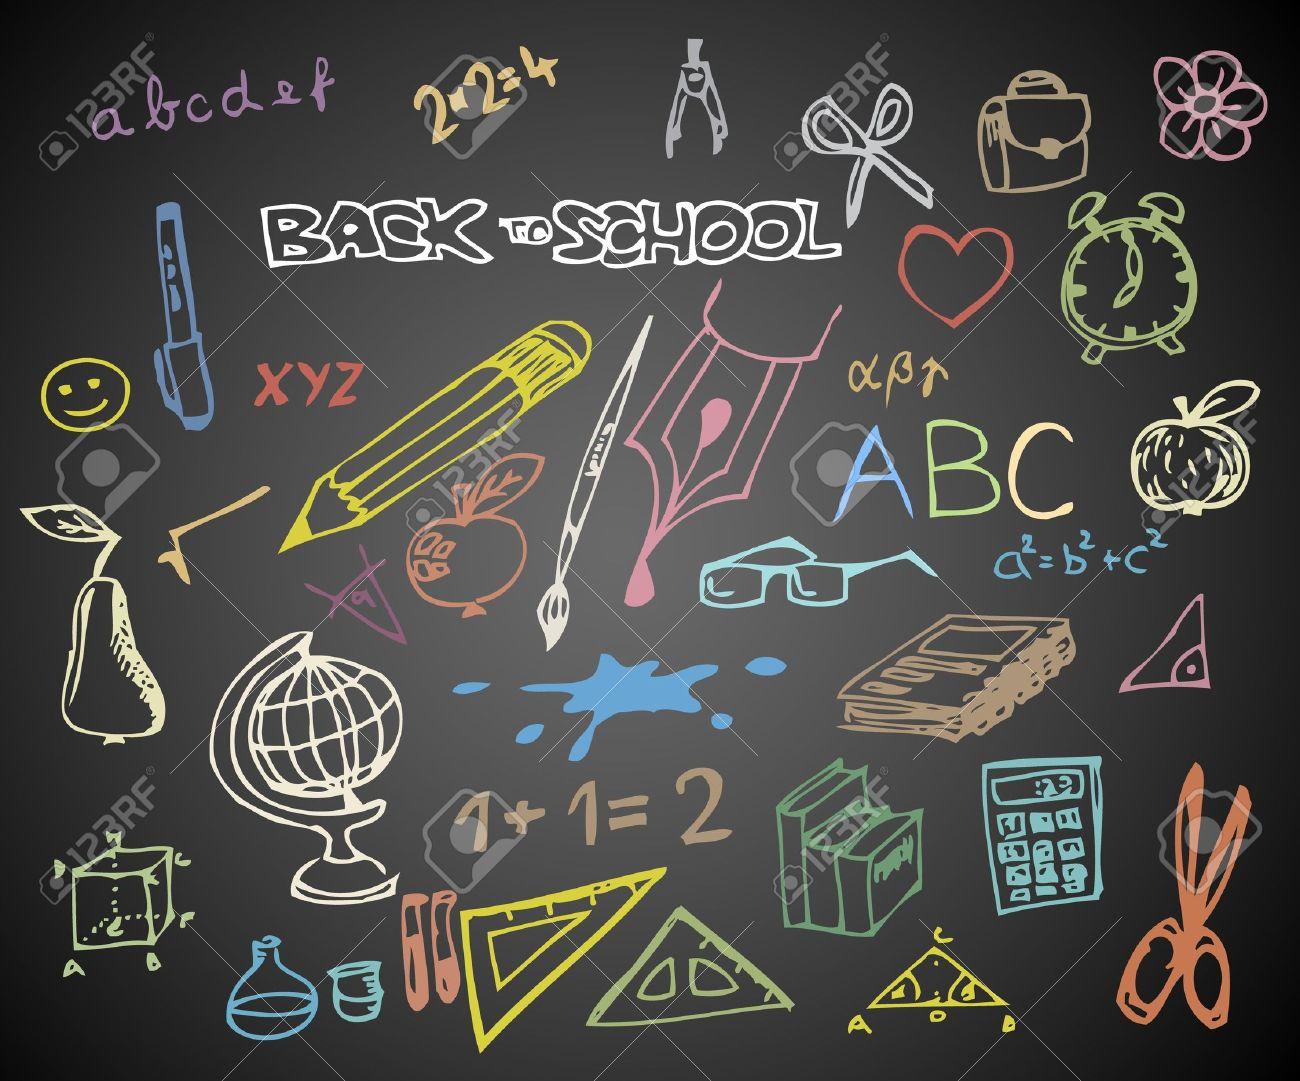 Back to school - set of school doodle vector illustrations on blackboard Stock Vector - 10470707